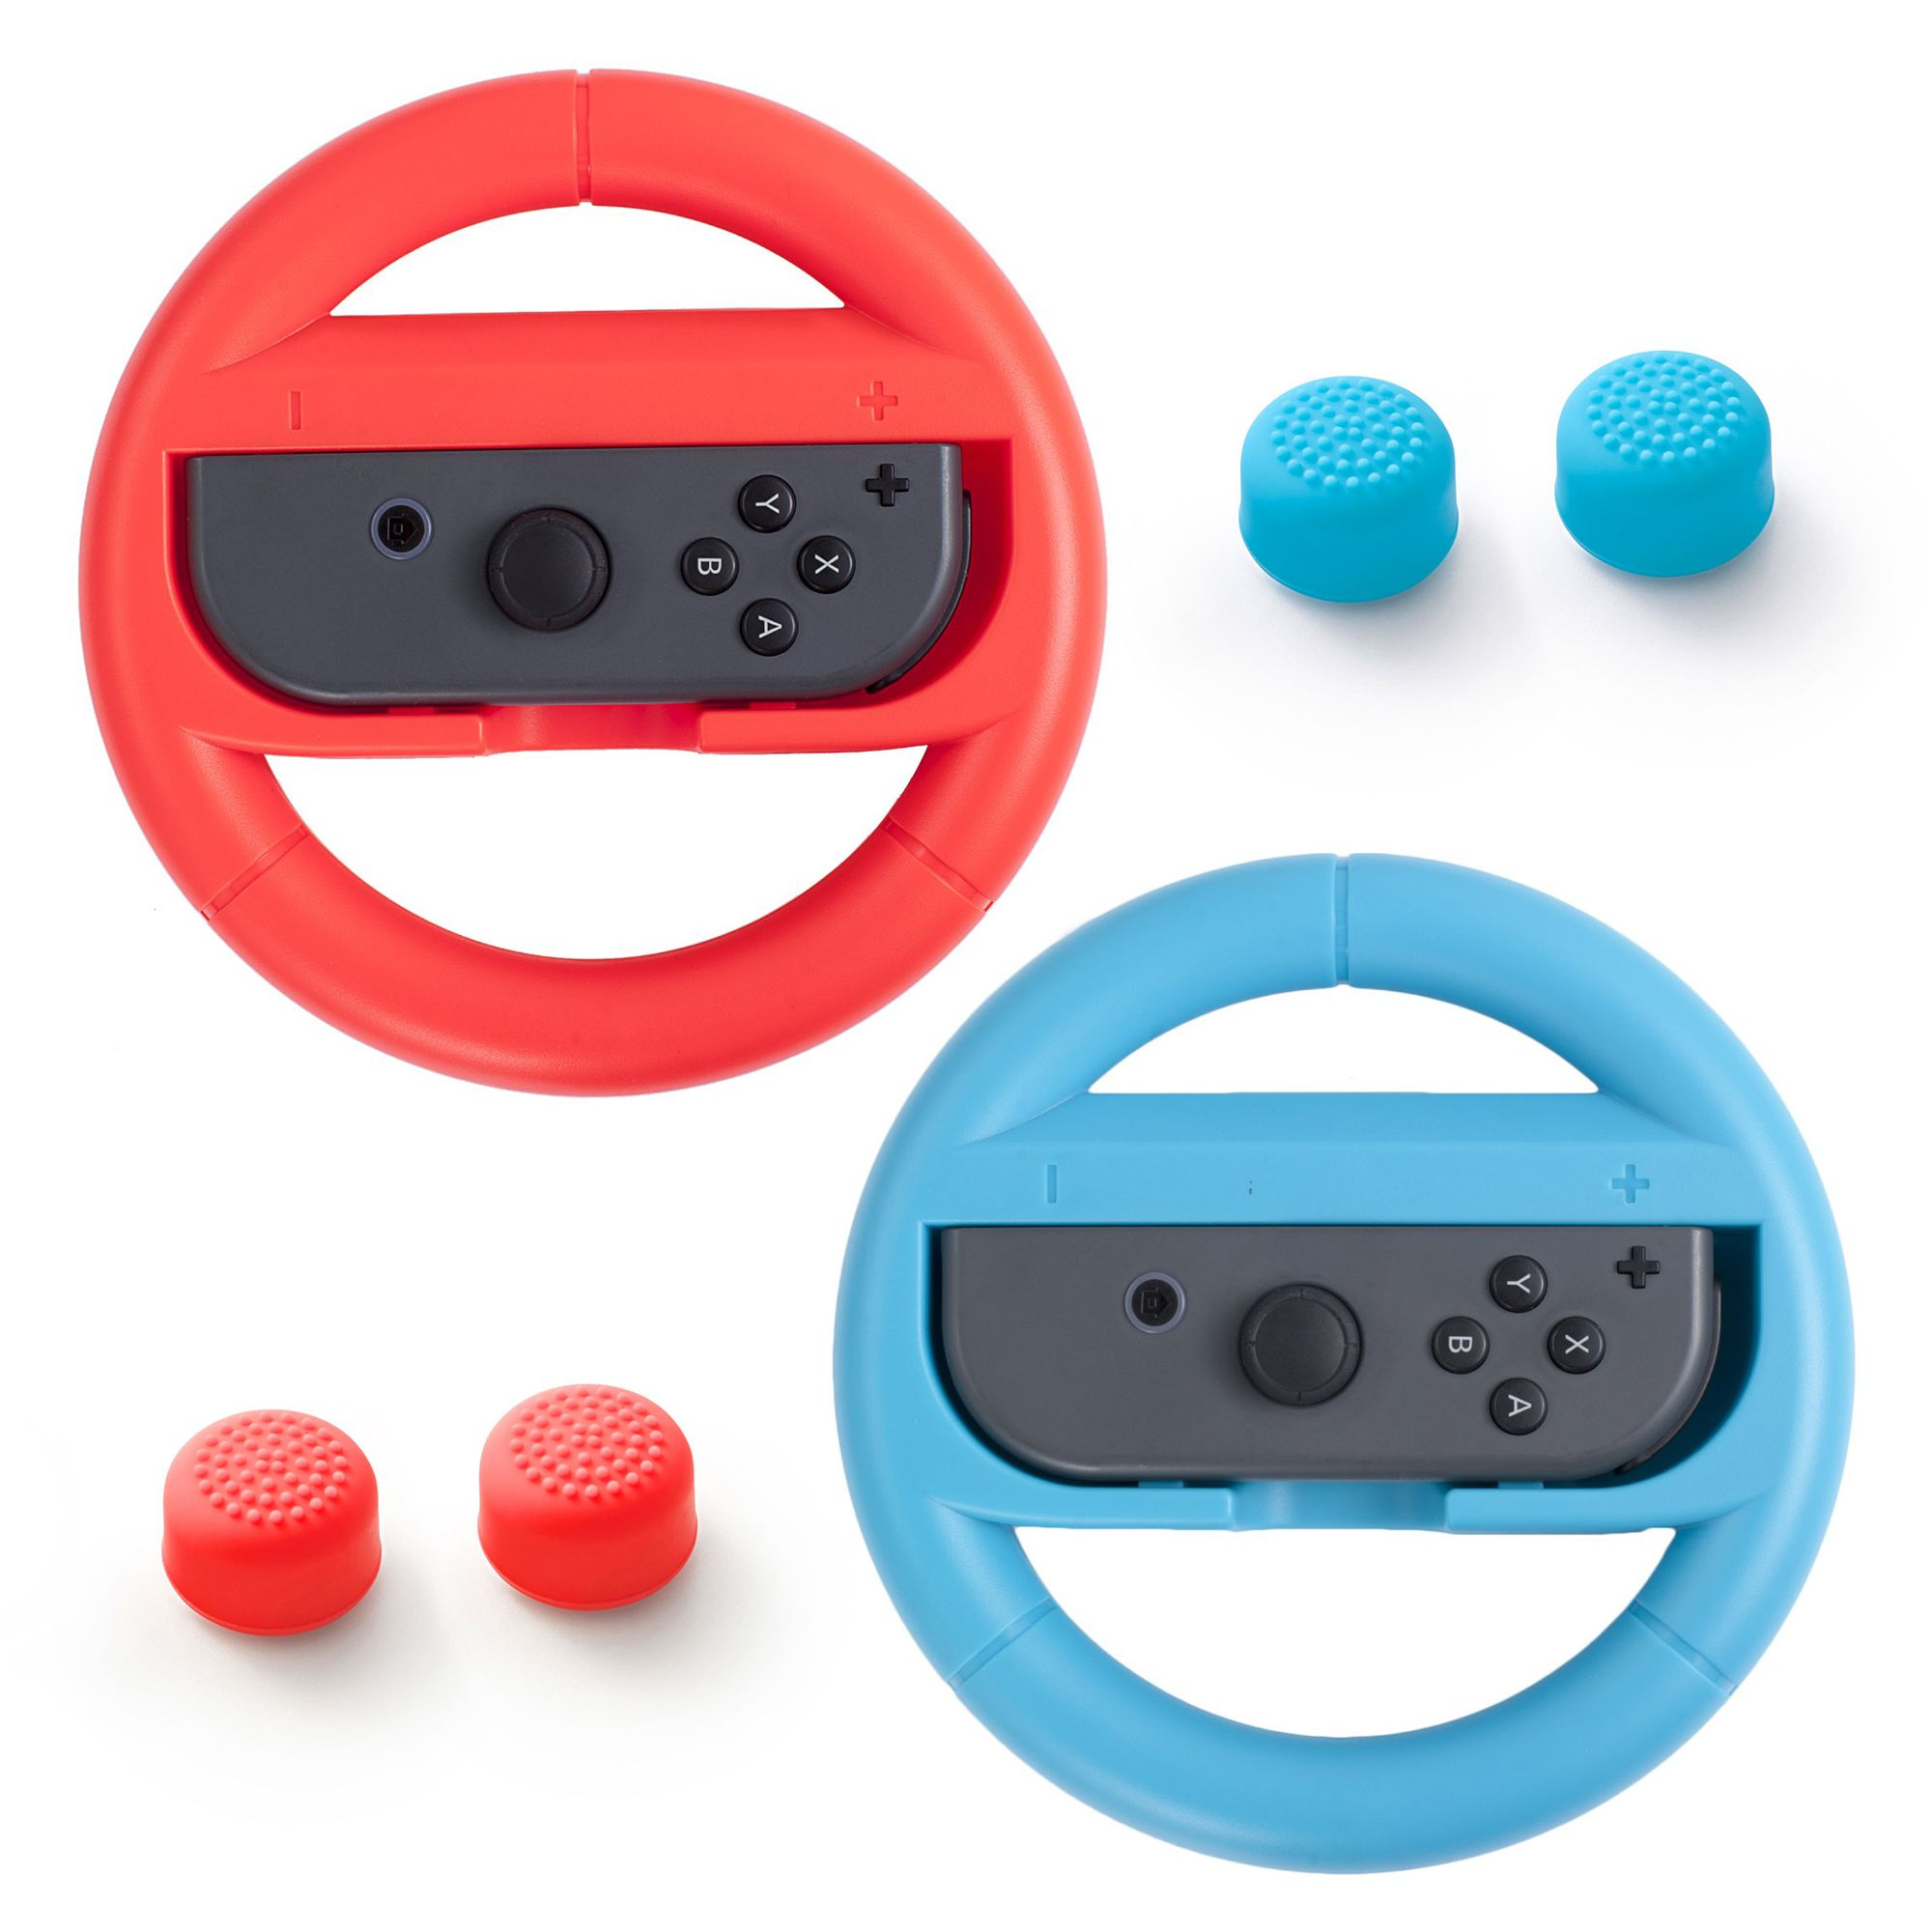 Insten 2-pack Joy-Con Controller Steering Wheel Durable Handle Grip + Analog Thumbstick Cap for Nintendo Switch